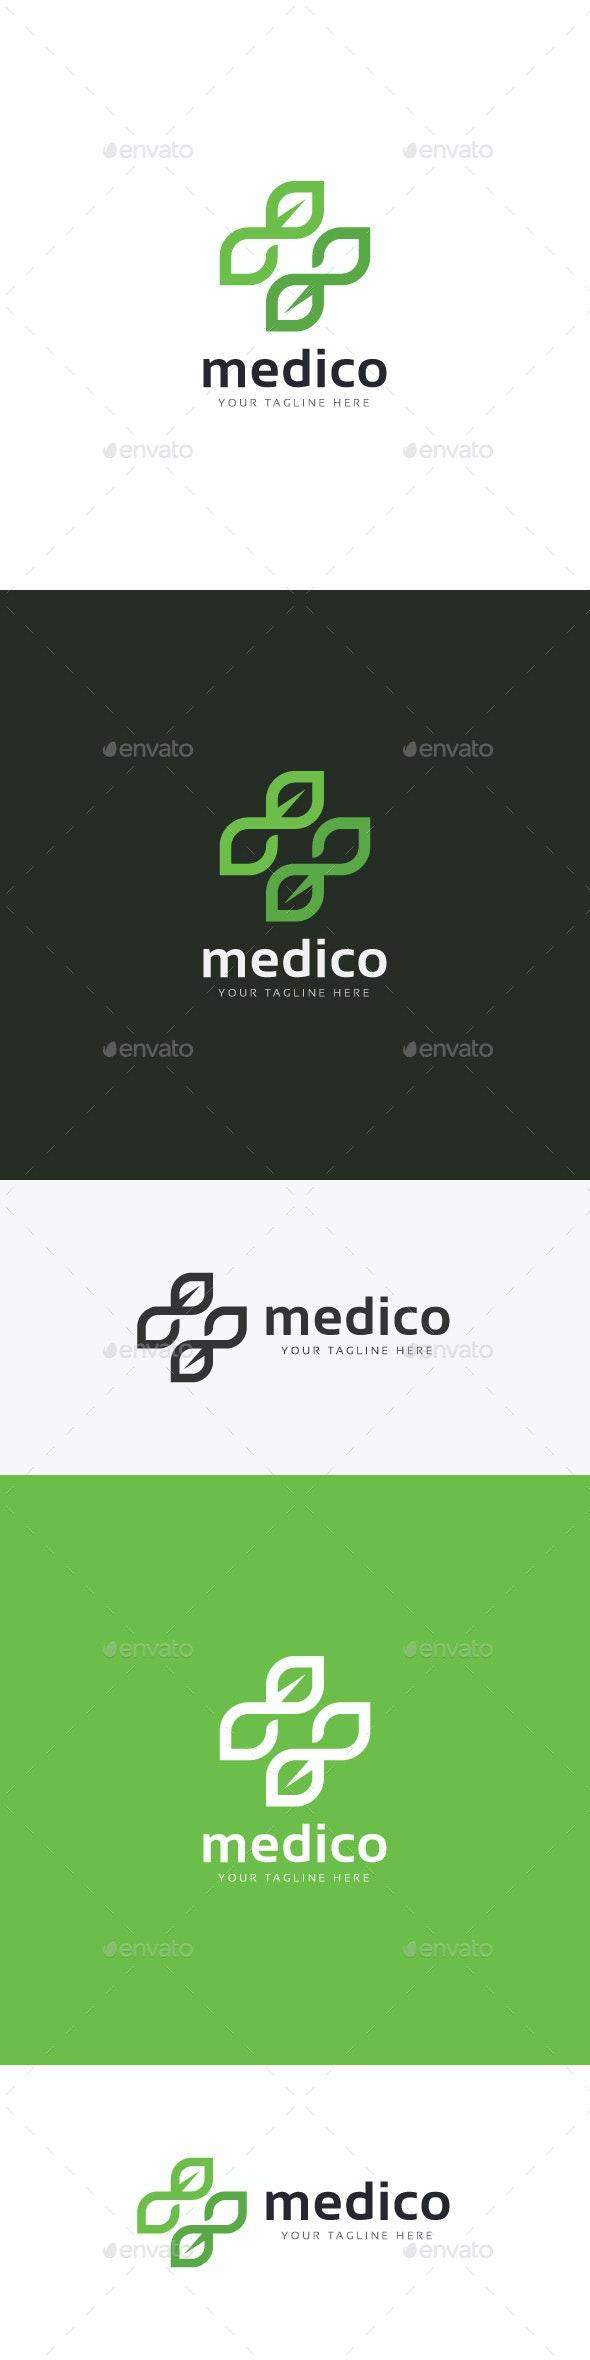 Medical Eco Logo - Nature Logo Templates